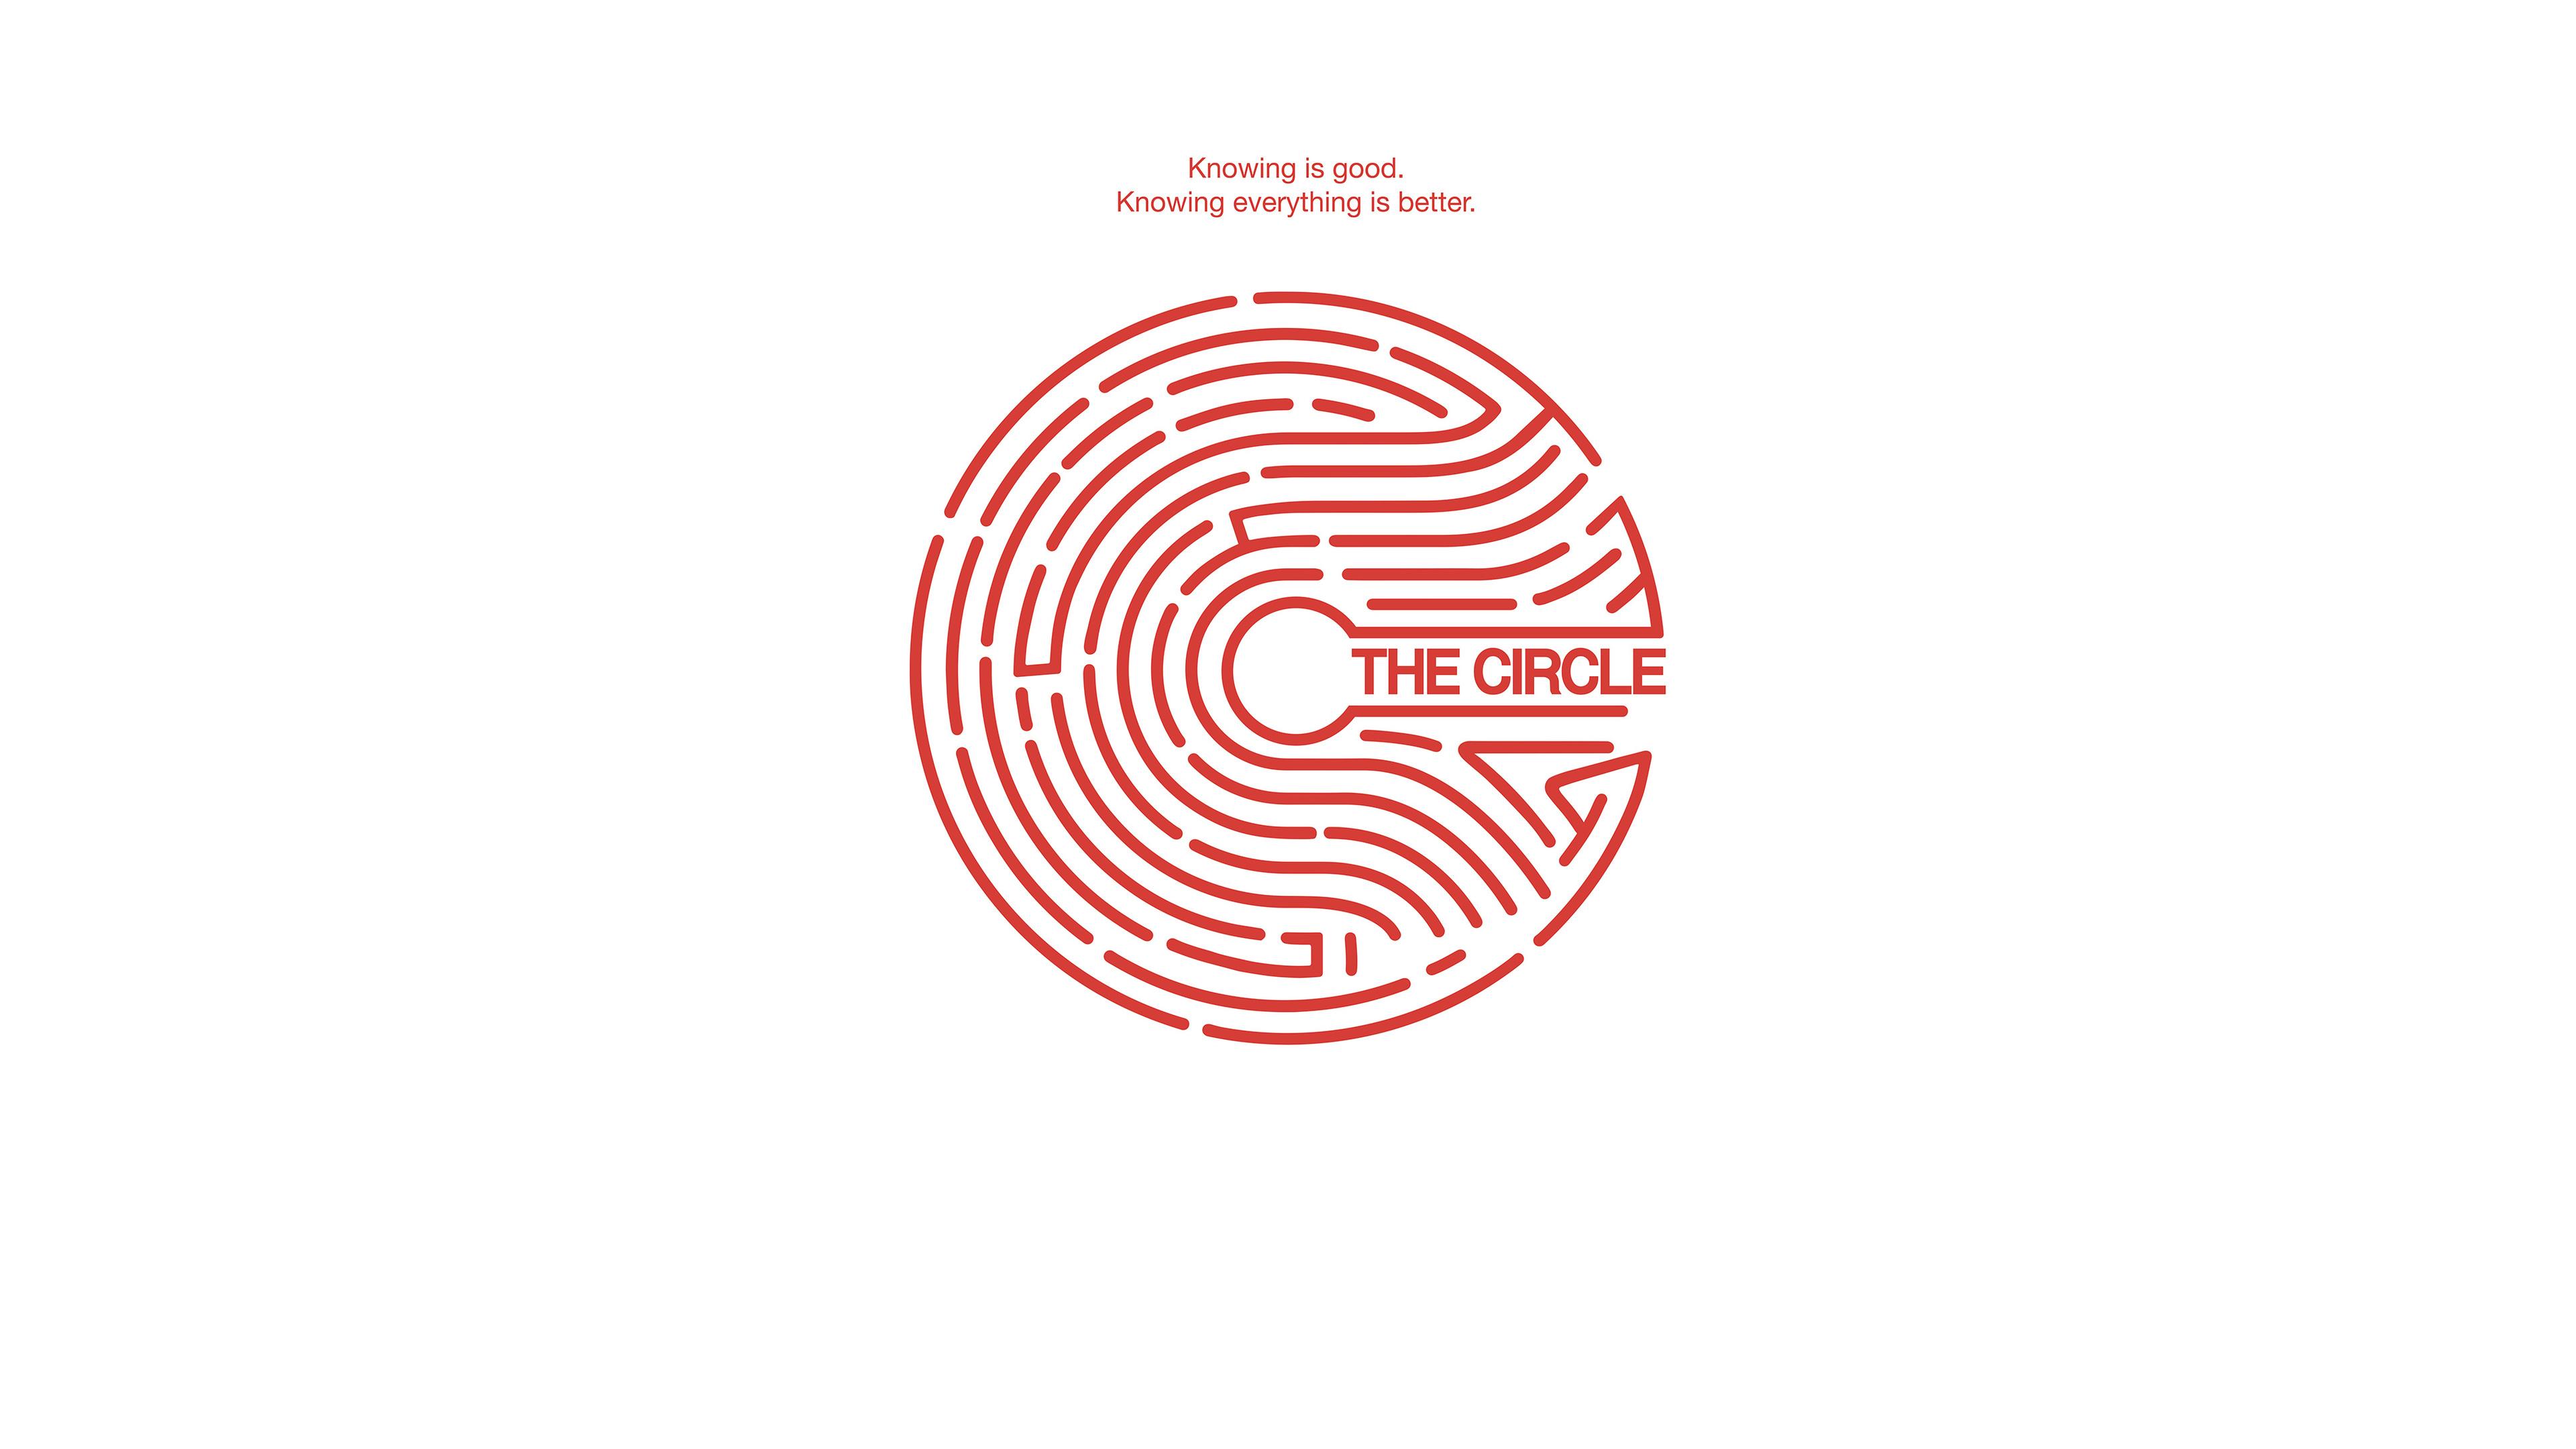 the circle 2017 movie 1536401963 - The Circle 2017 Movie - the circle wallpapers, movies wallpapers, hd-wallpapers, 5k wallpapers, 2017 movies wallpapers